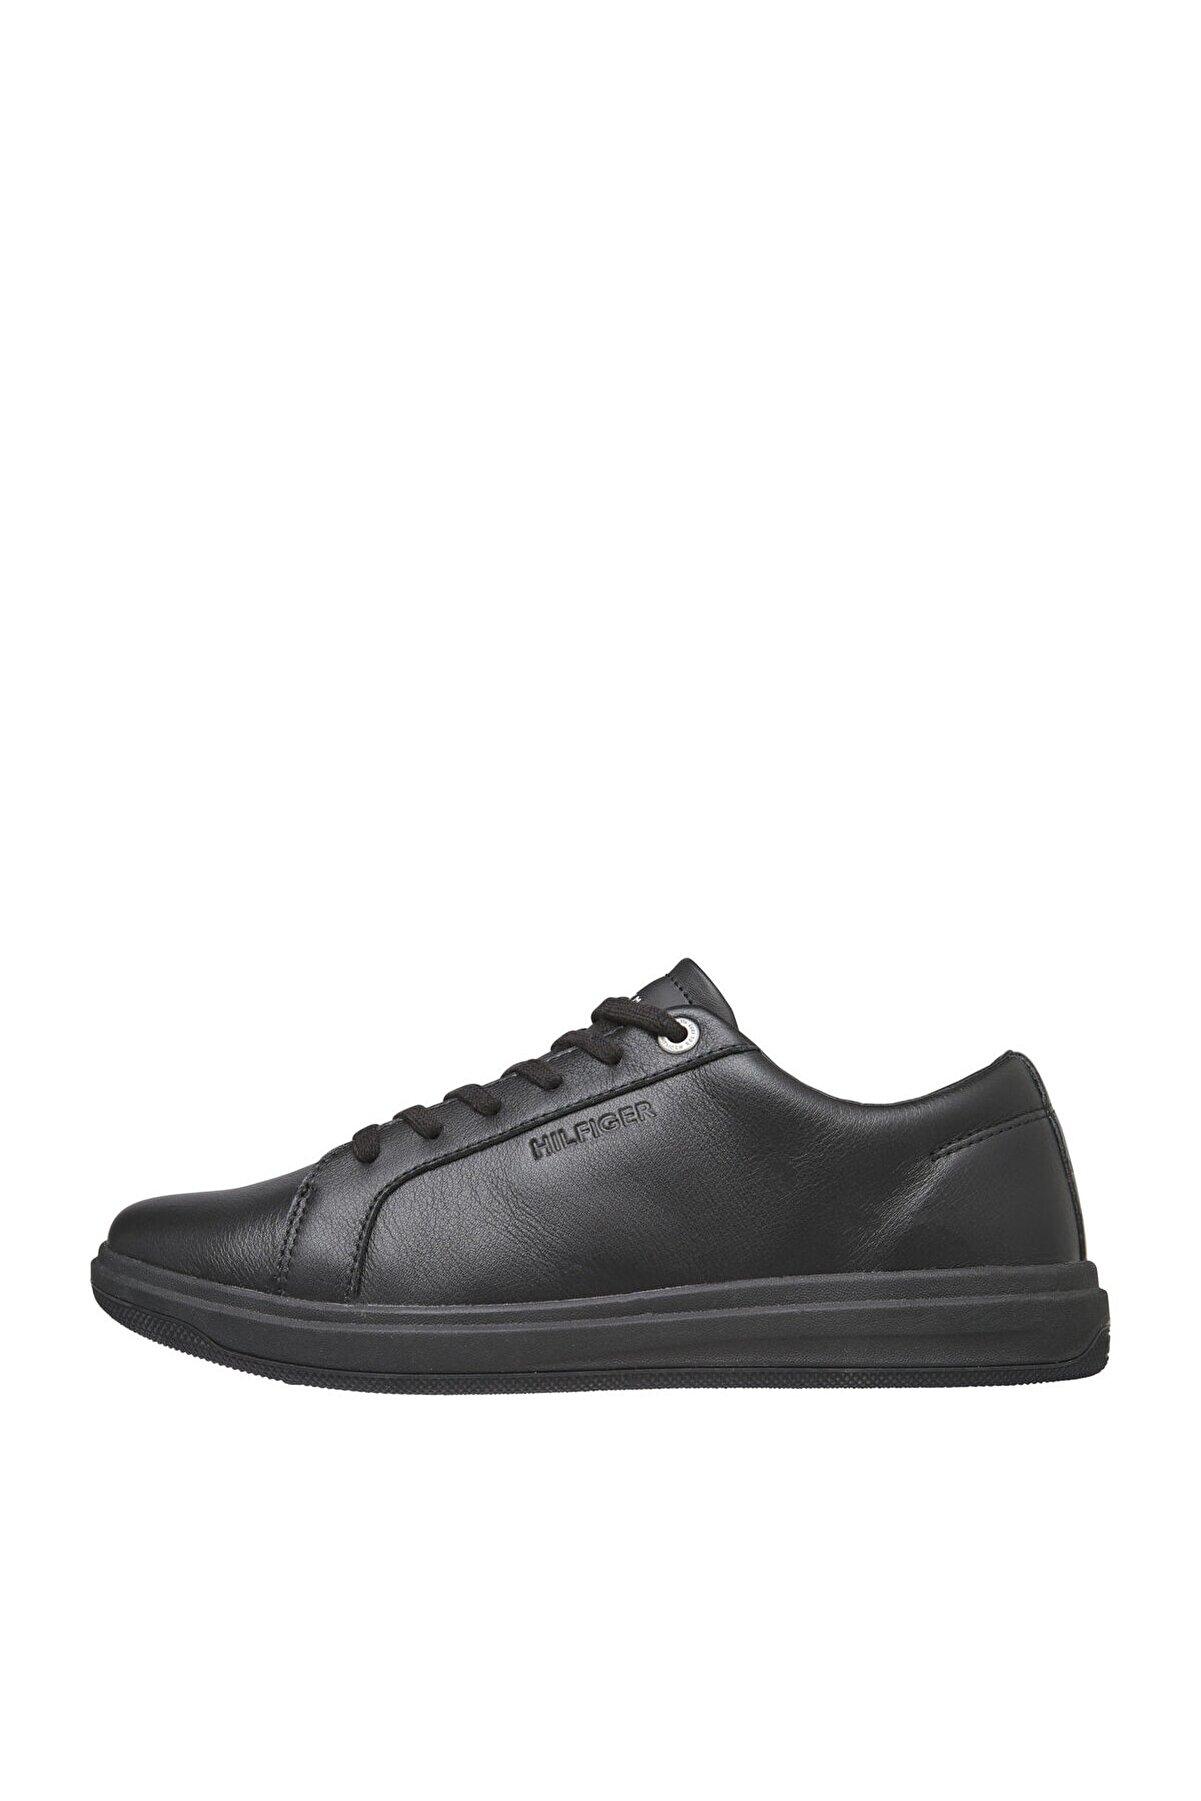 Tommy Hilfiger Erkek Siyah Sneaker Modern Clean  Deri Cupsole FM0FM02992